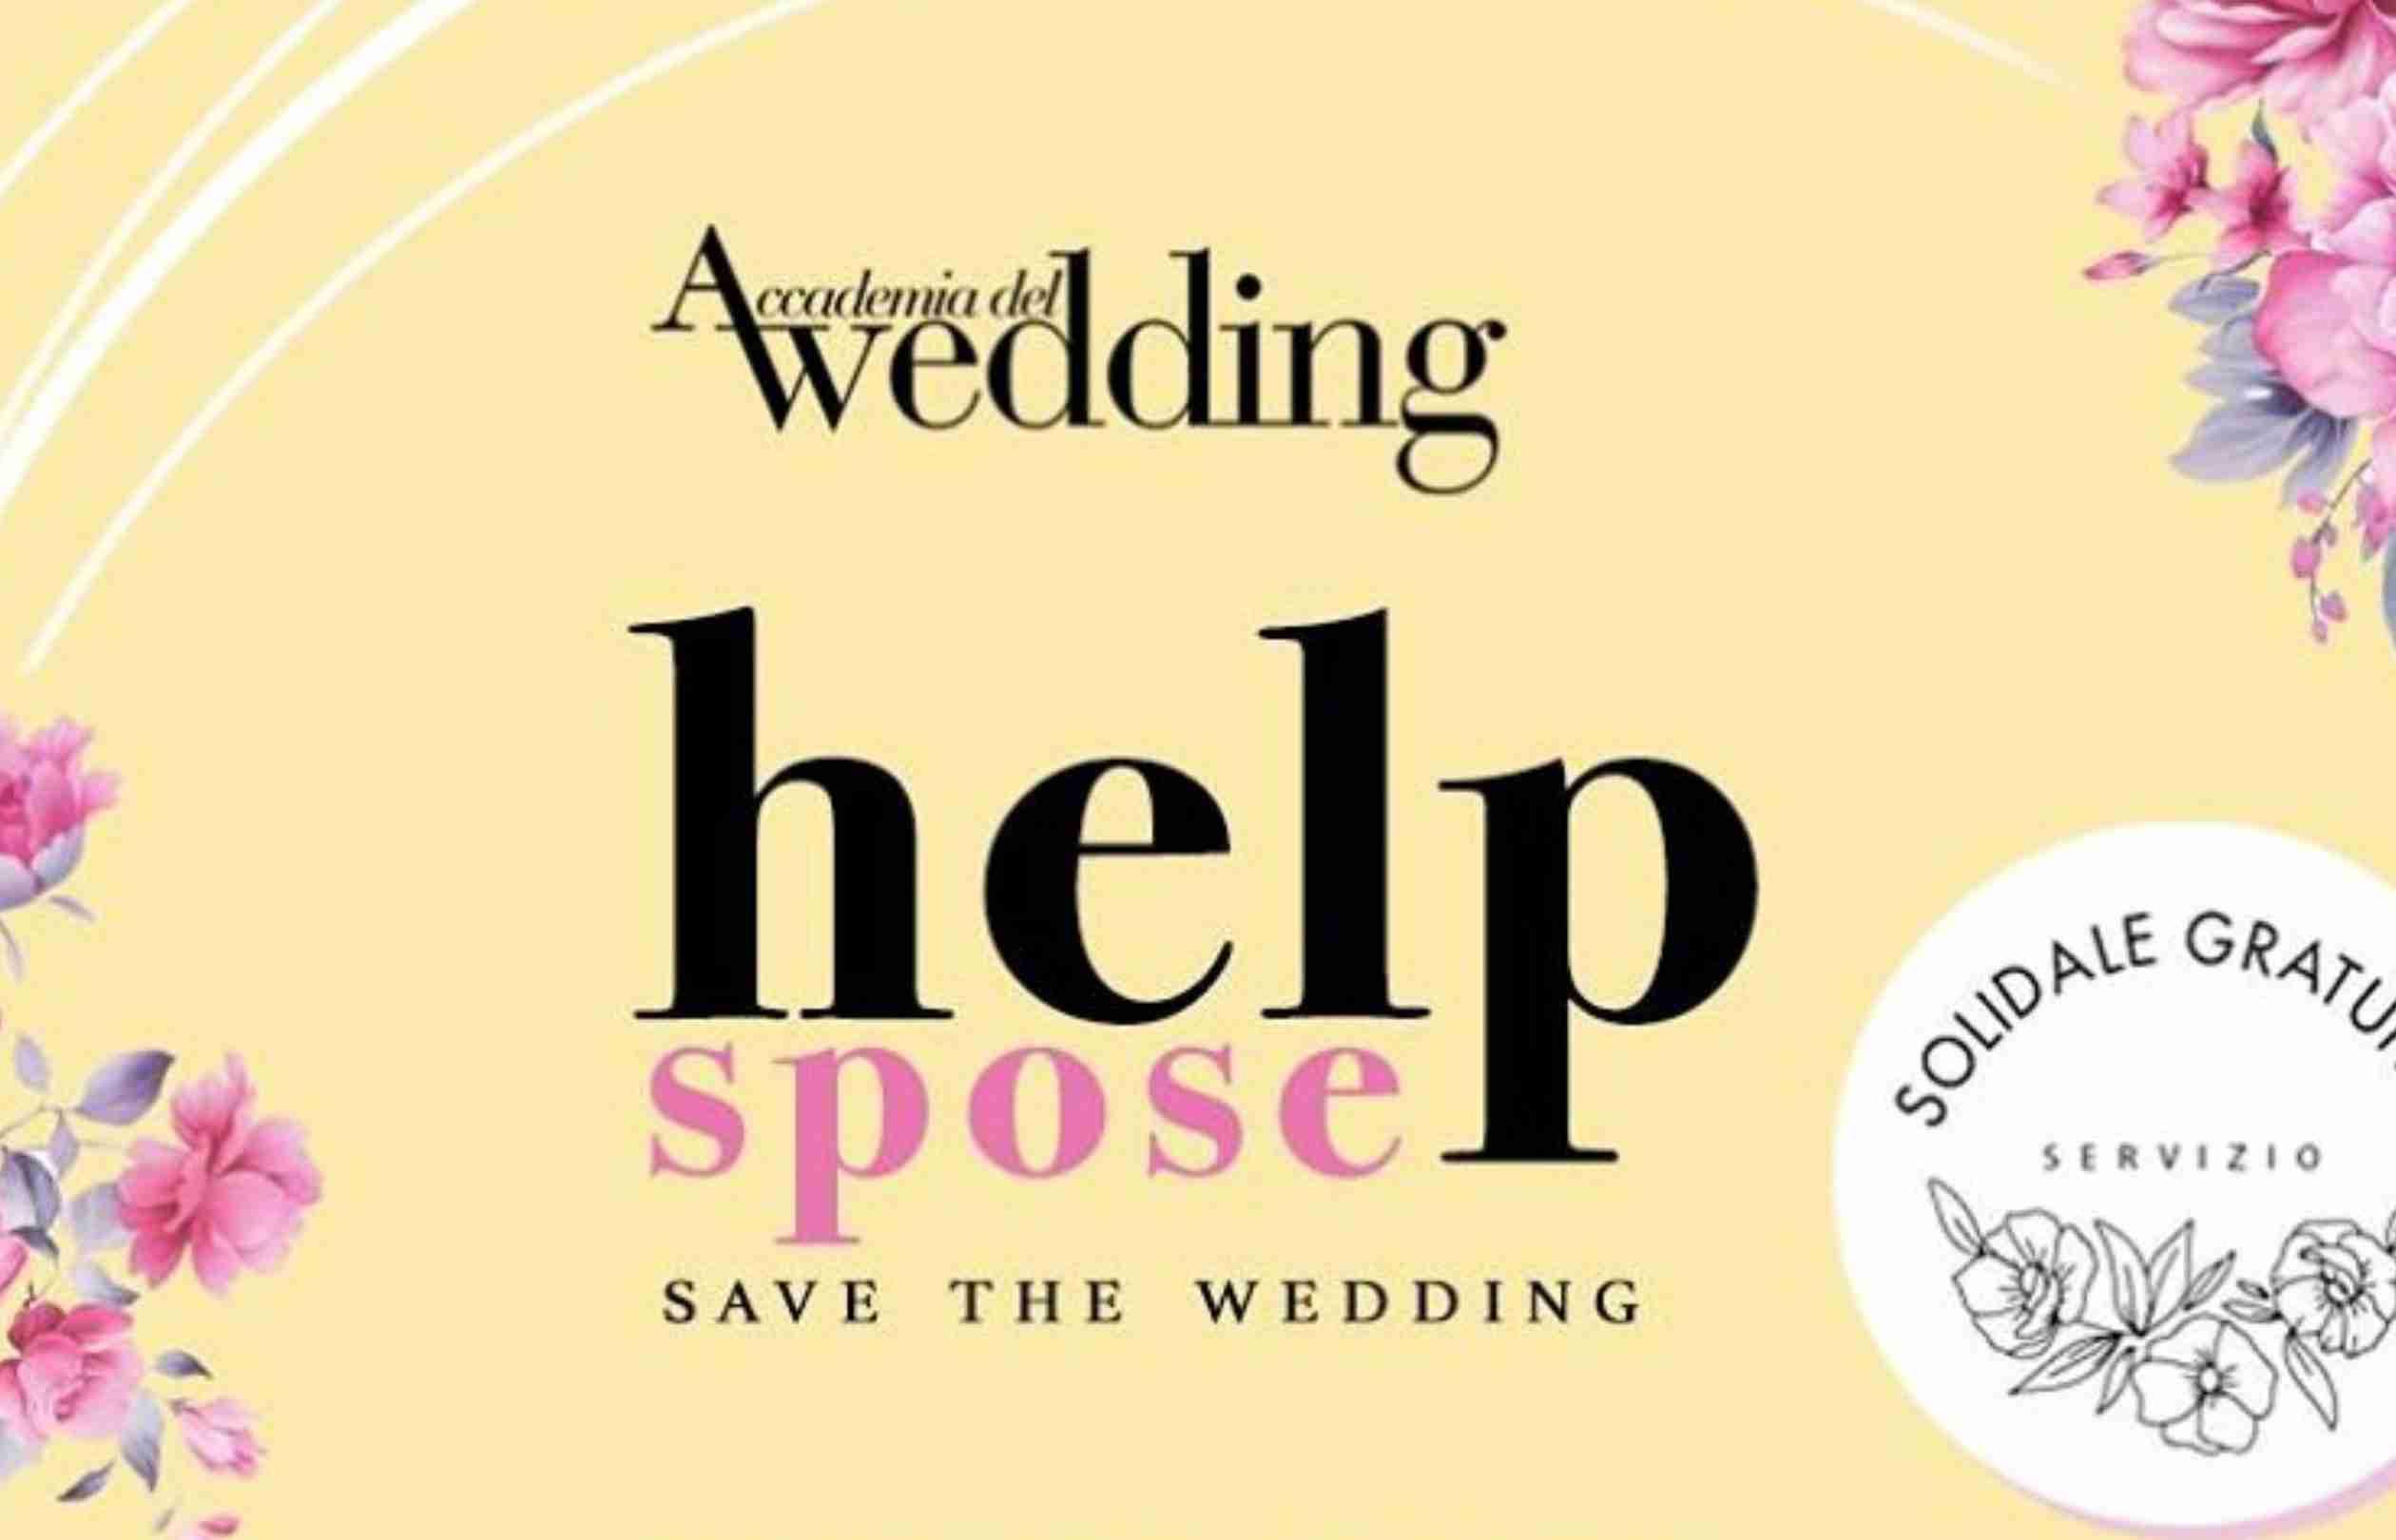 Help-spose